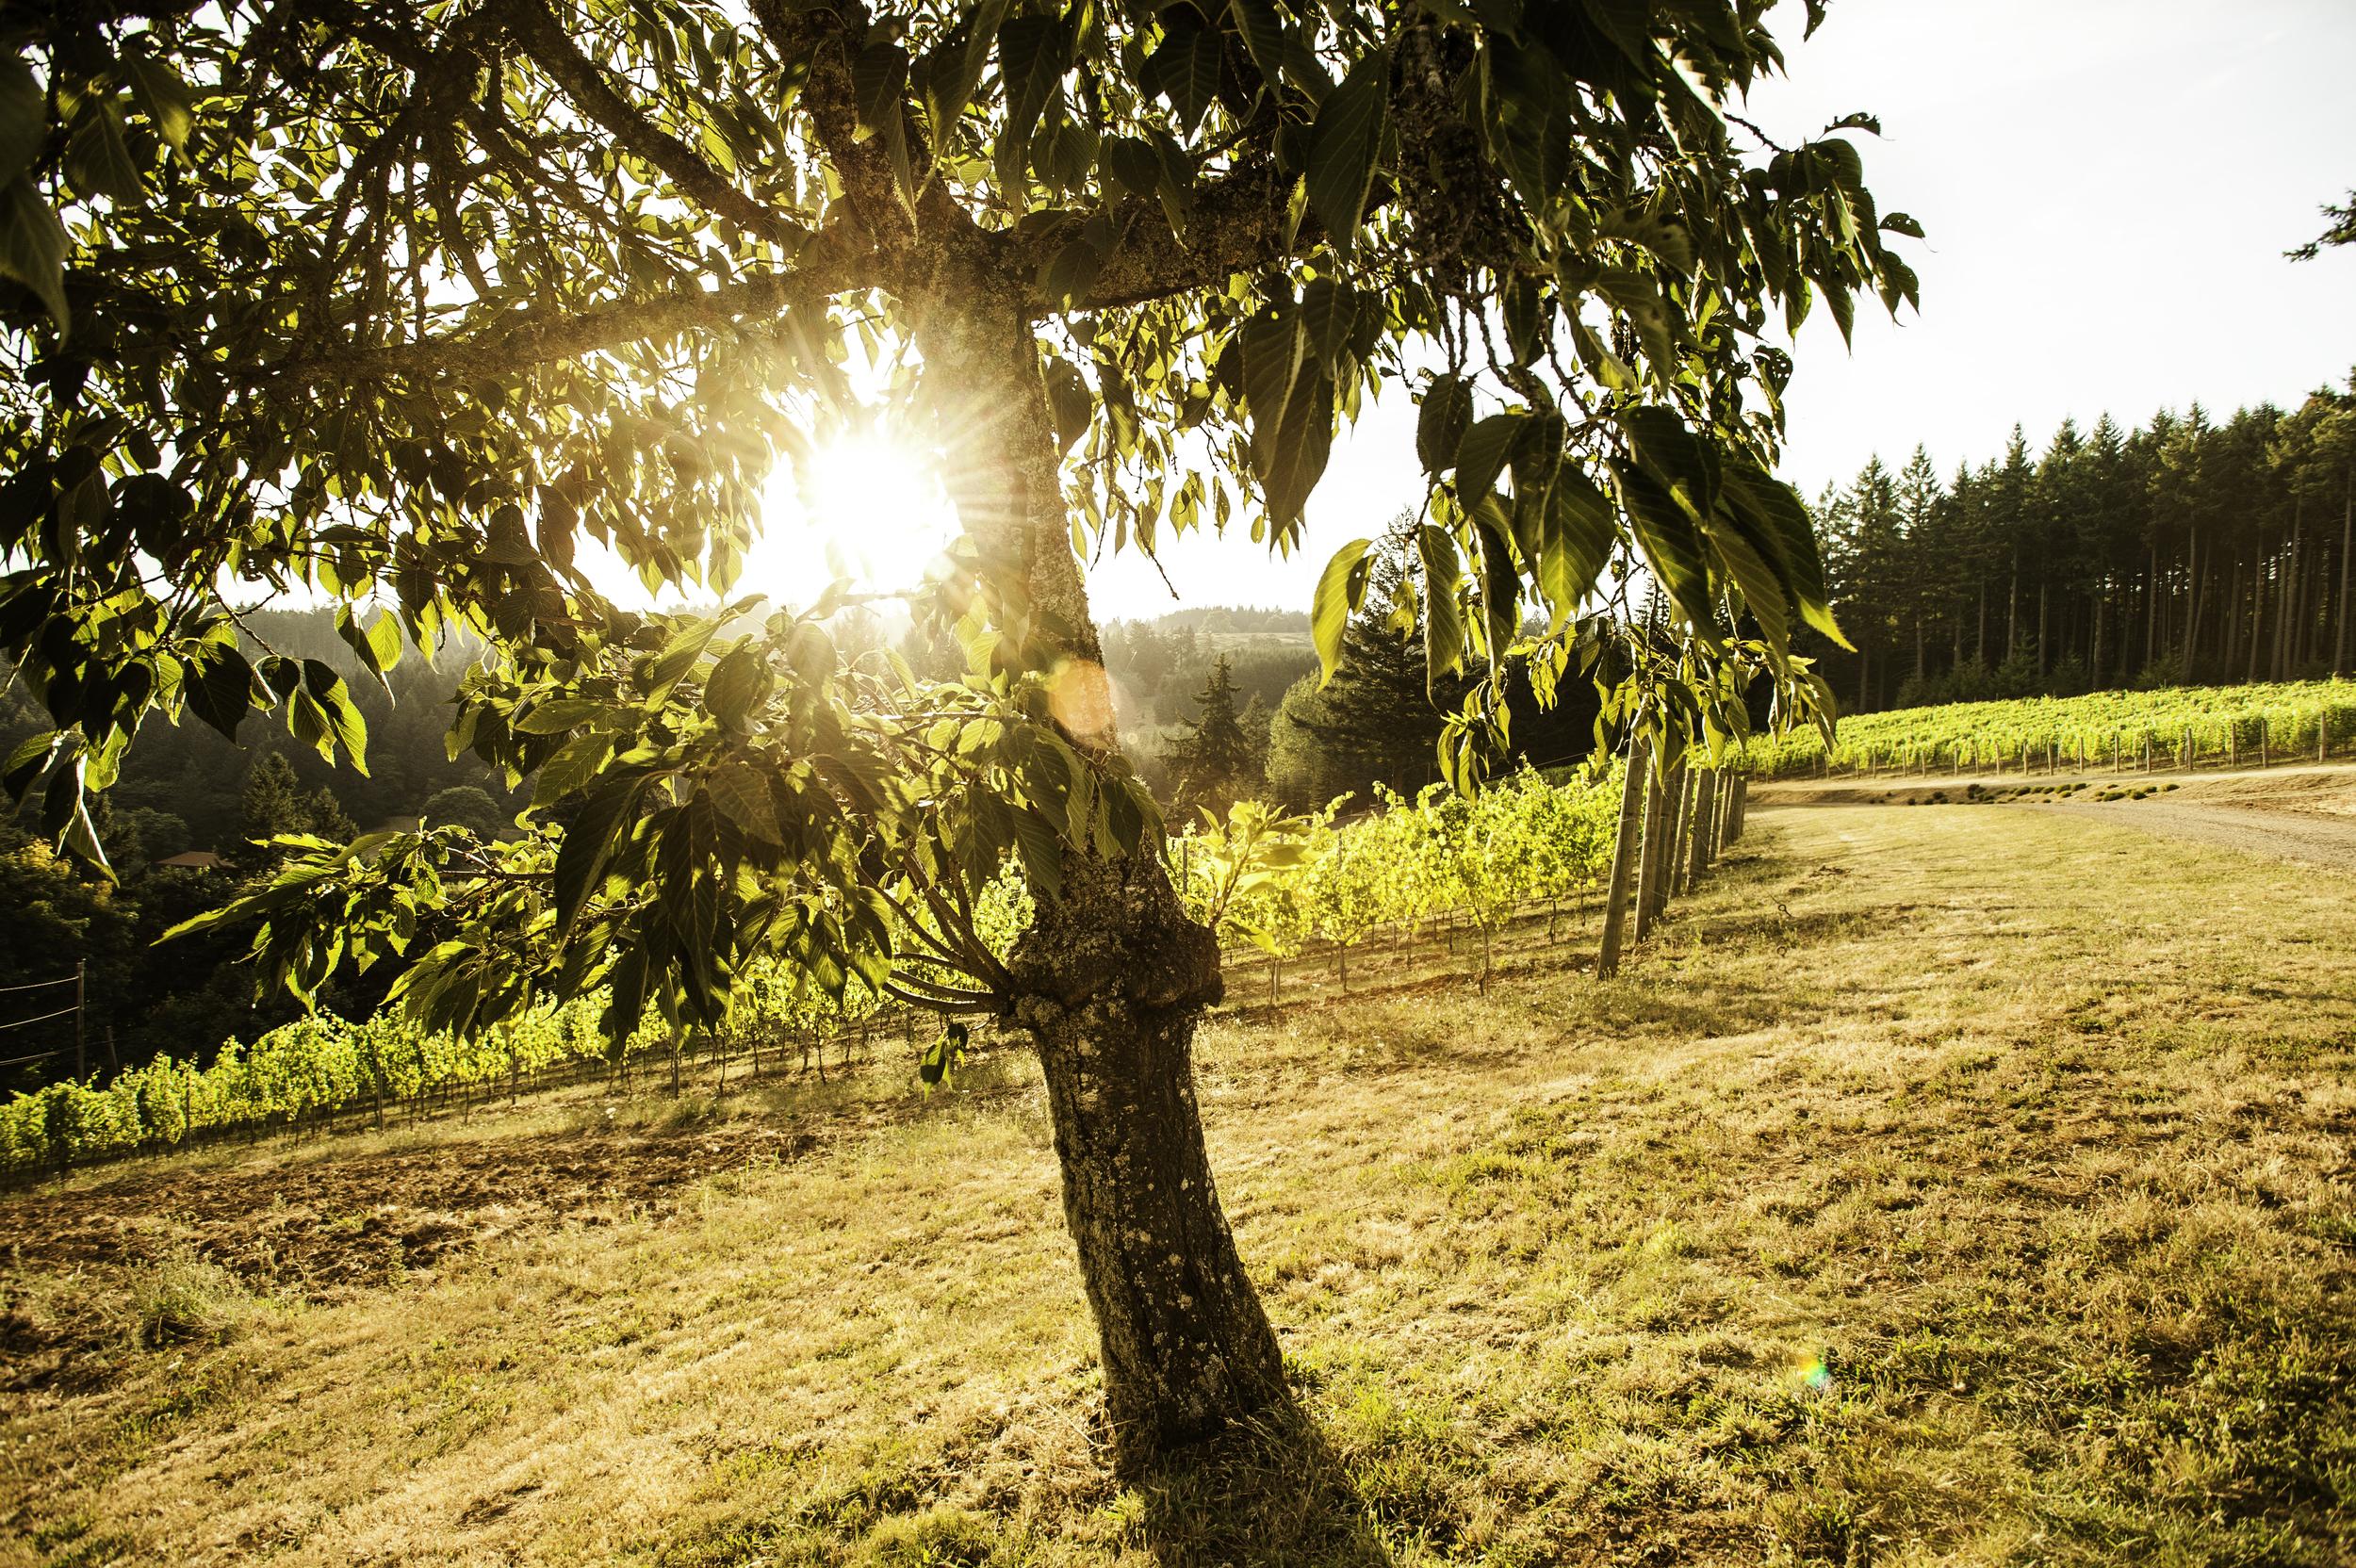 sunny tree and vines.jpg